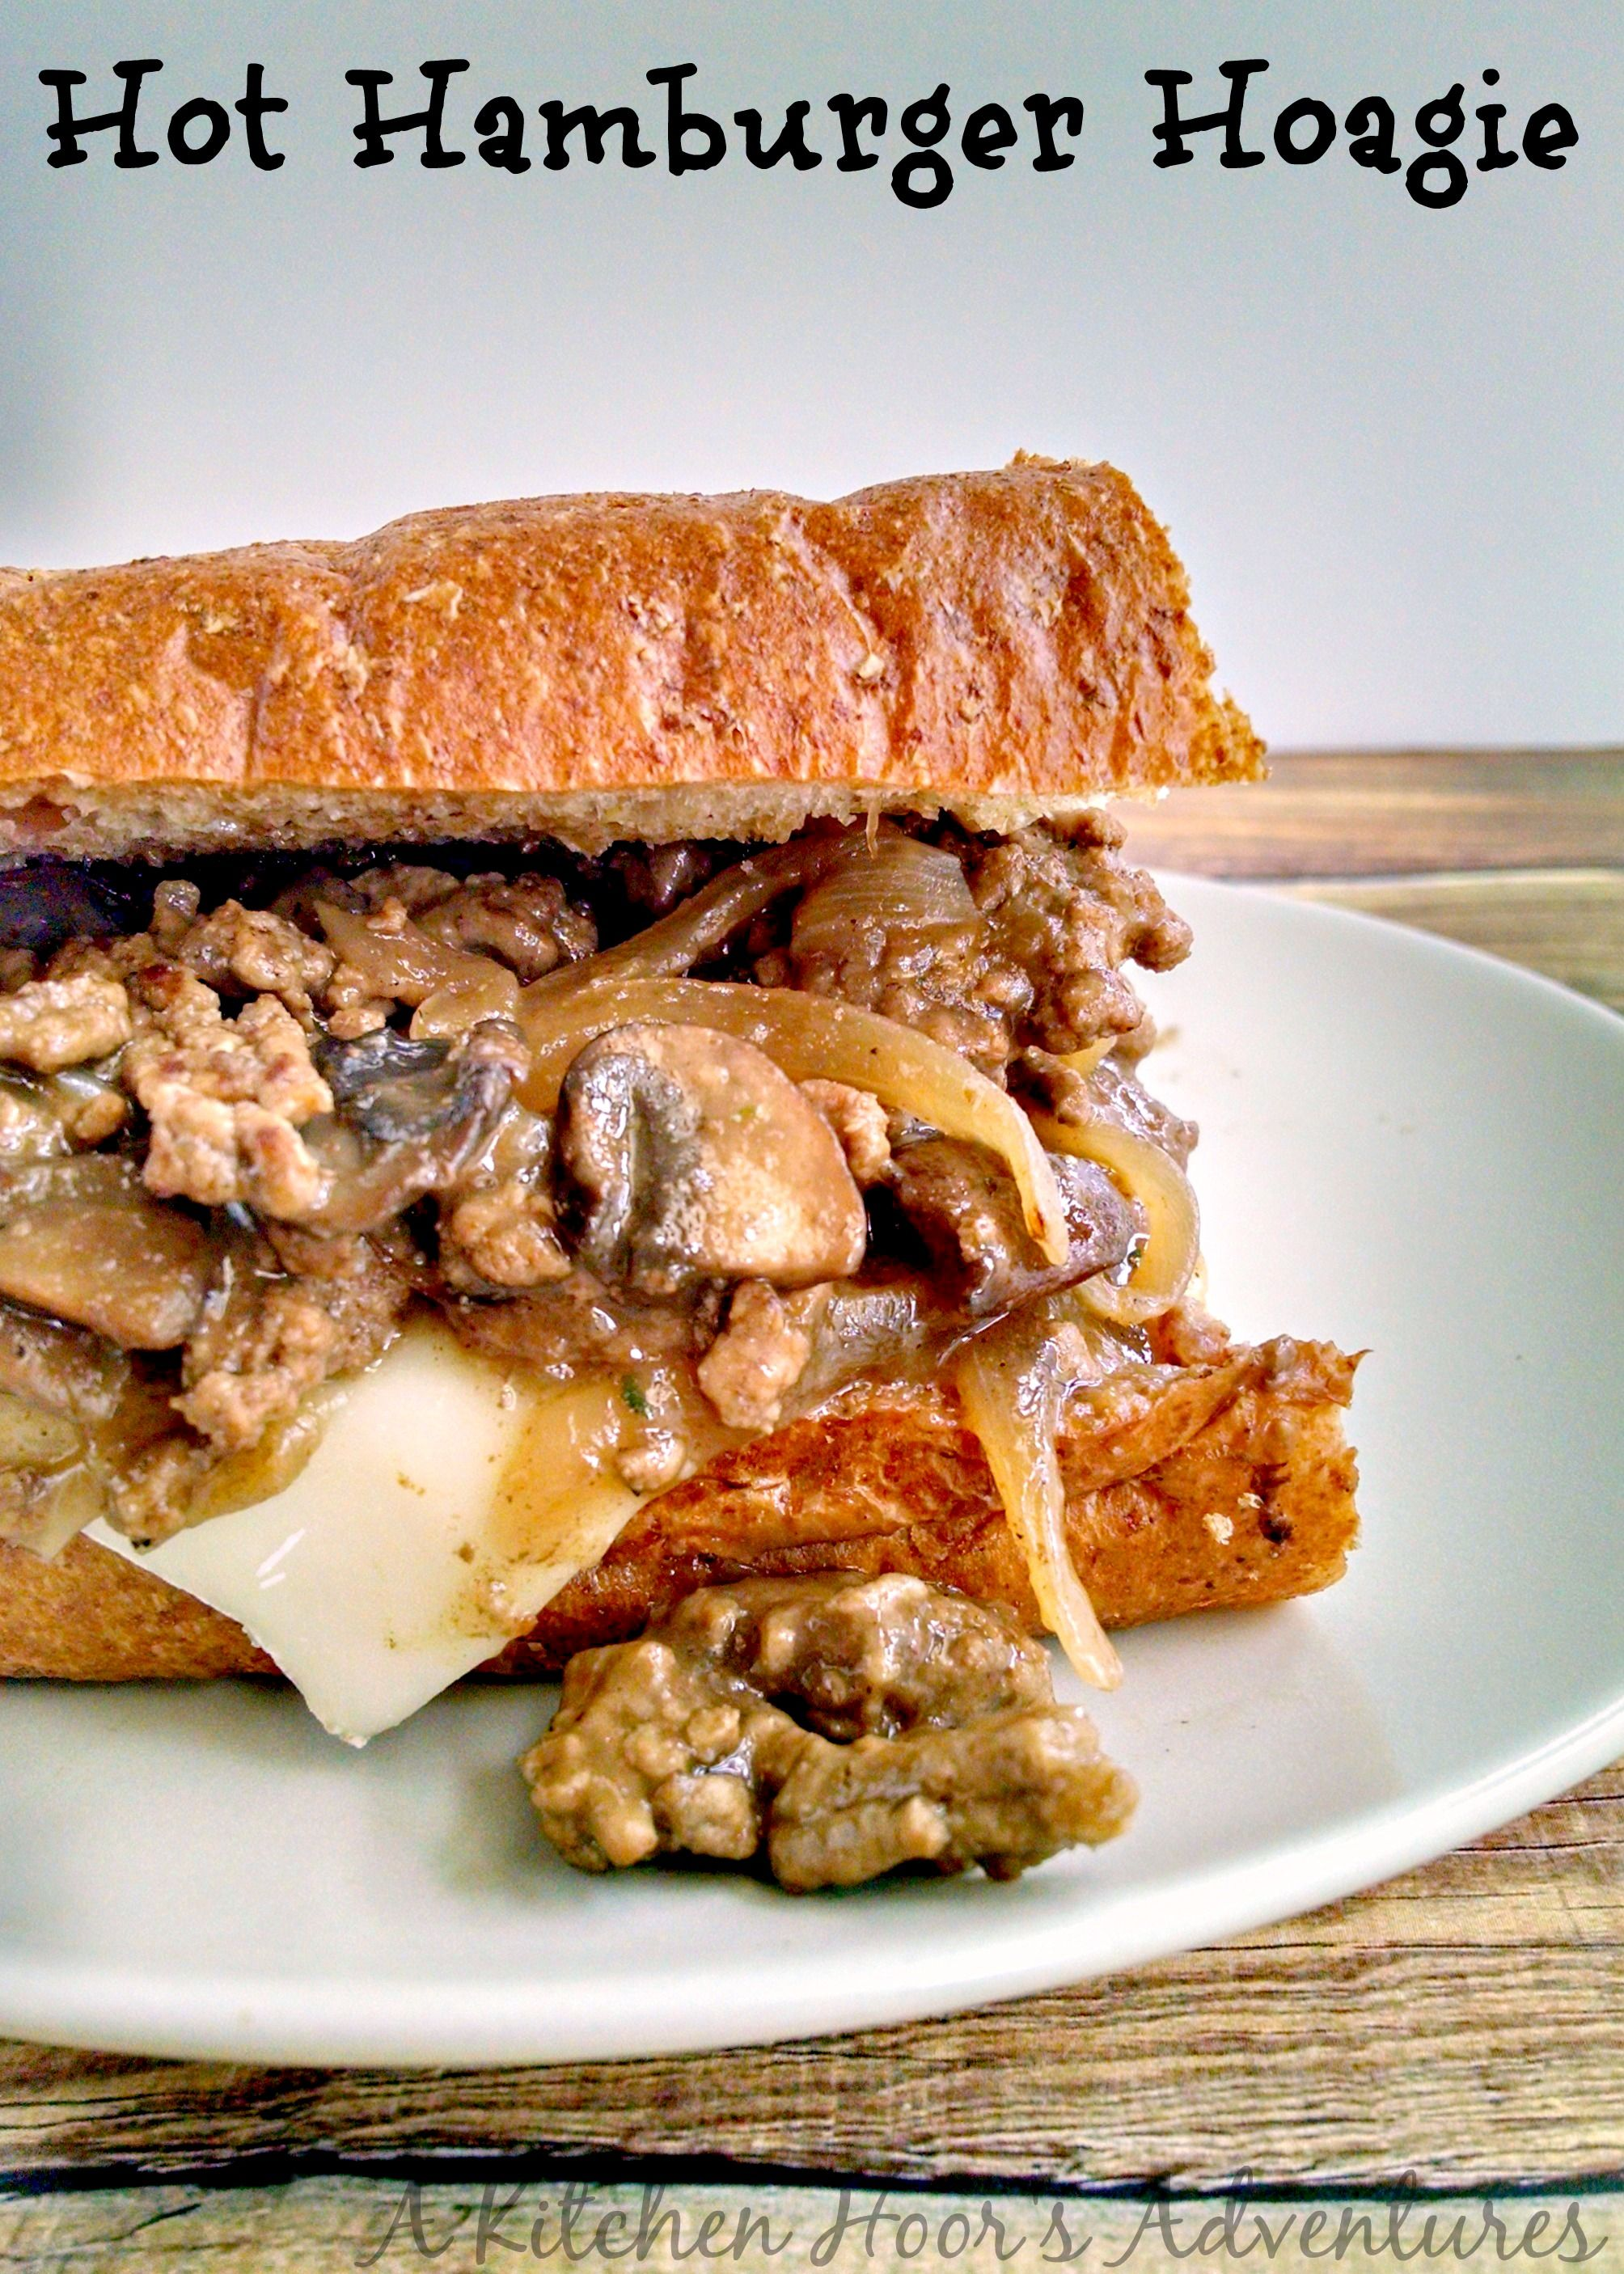 Hot hamburger hoagie receta hamburguesas recetas para for Platos faciles para cocinar